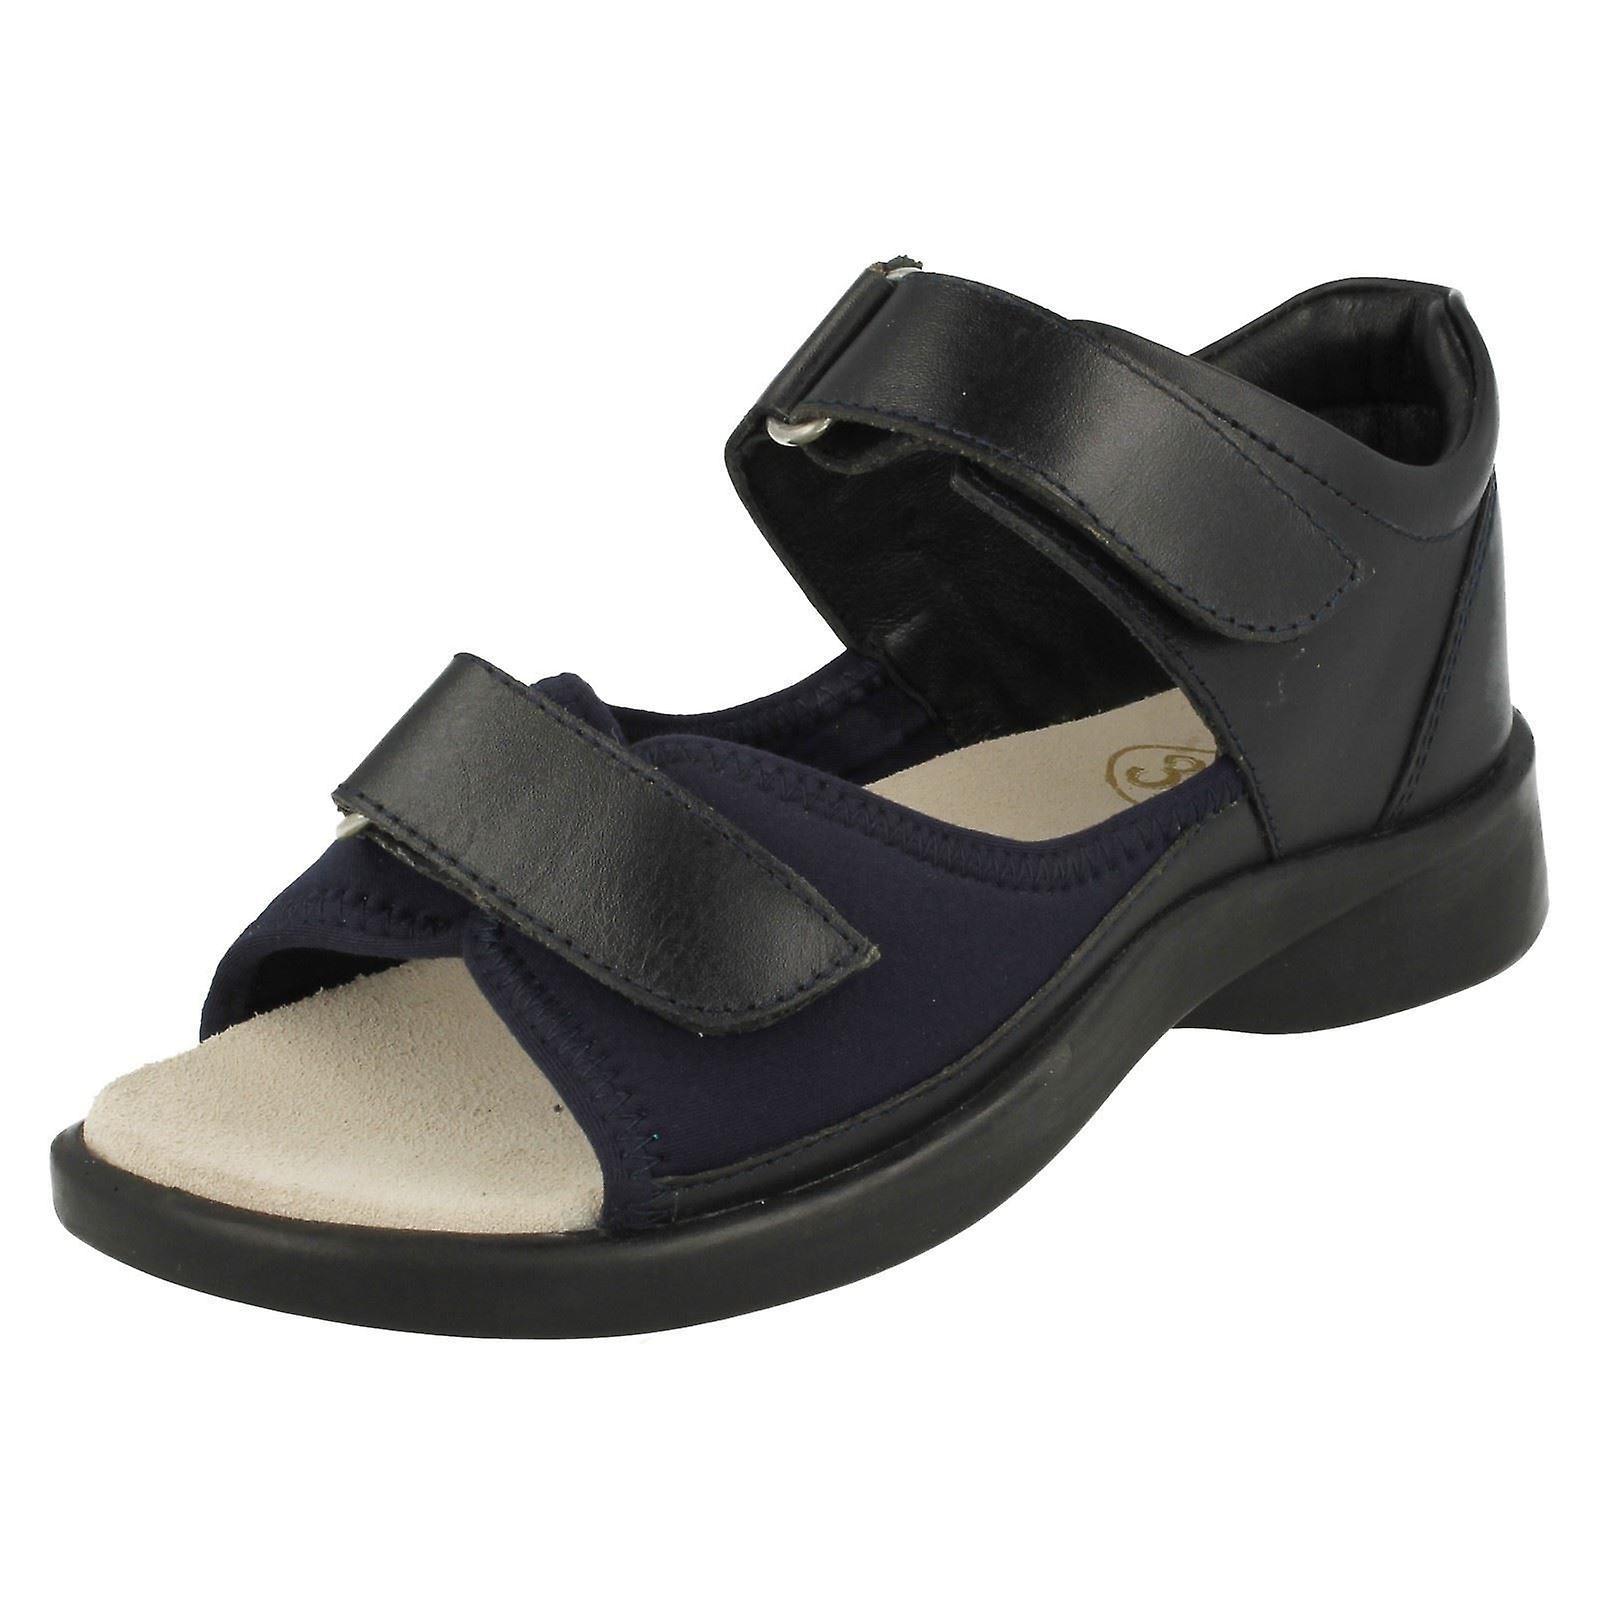 d7fa212e430 Ladies Equity Wide Fit Sandals Jasmine